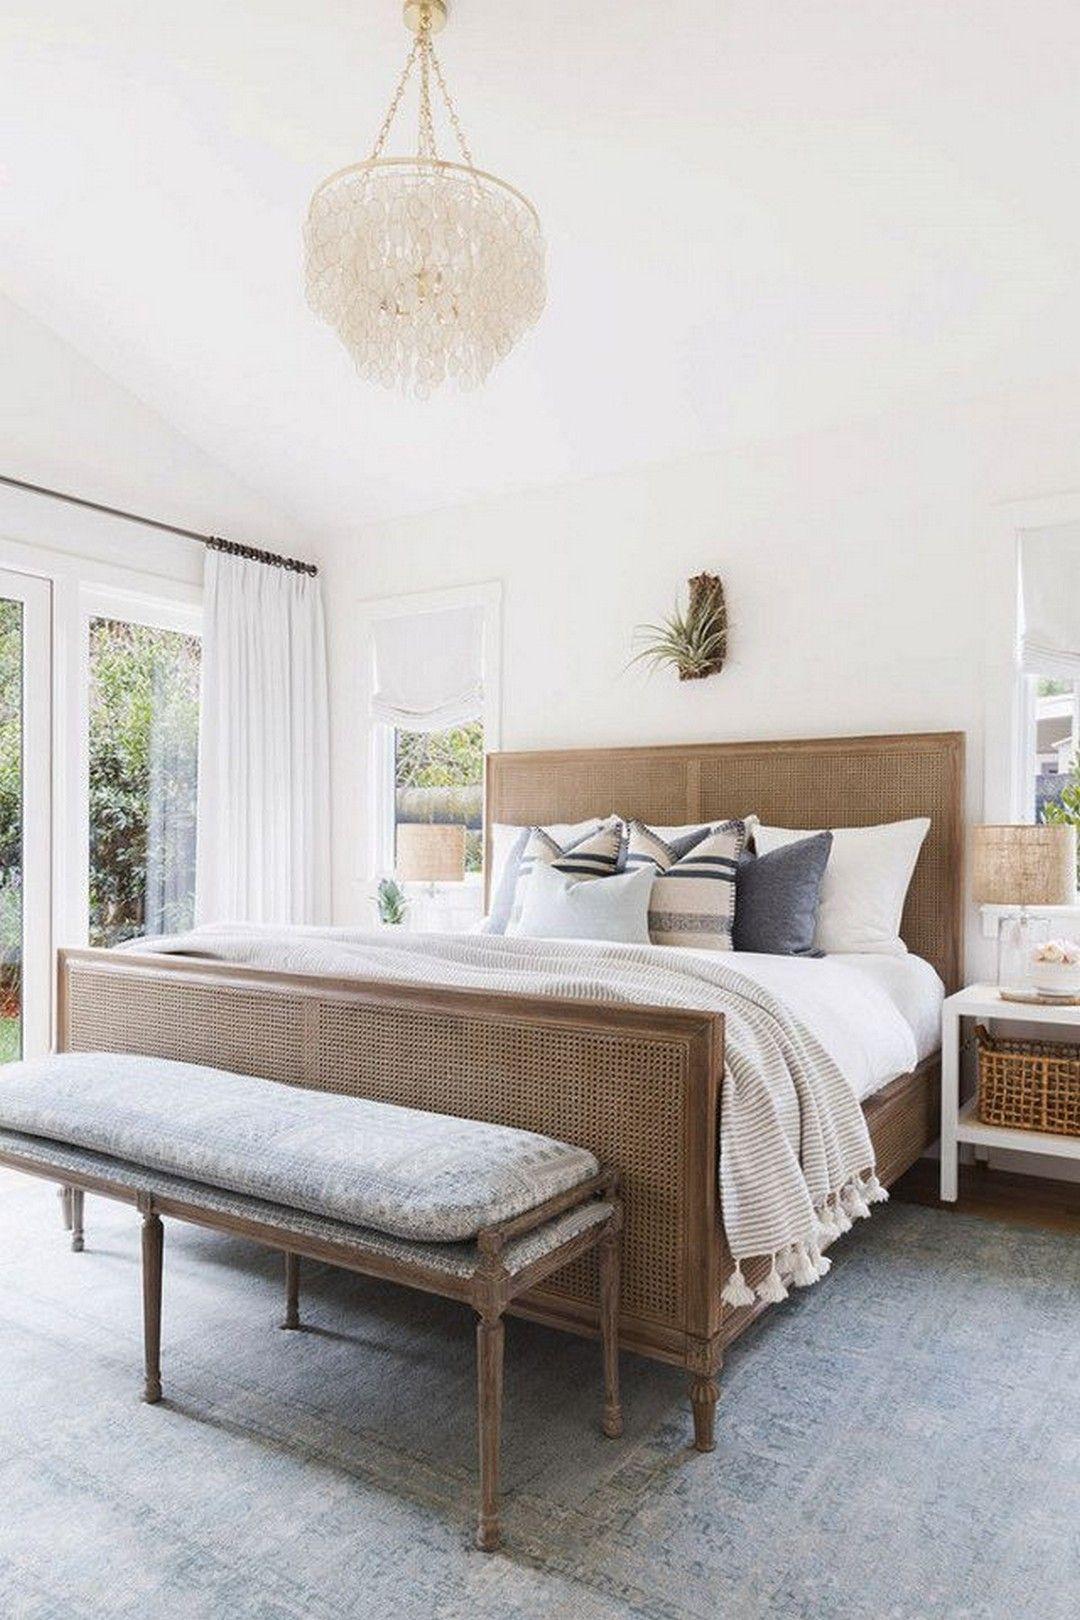 60 farmhouse bedroom decor ideas to make your favorite place rh pinterest com